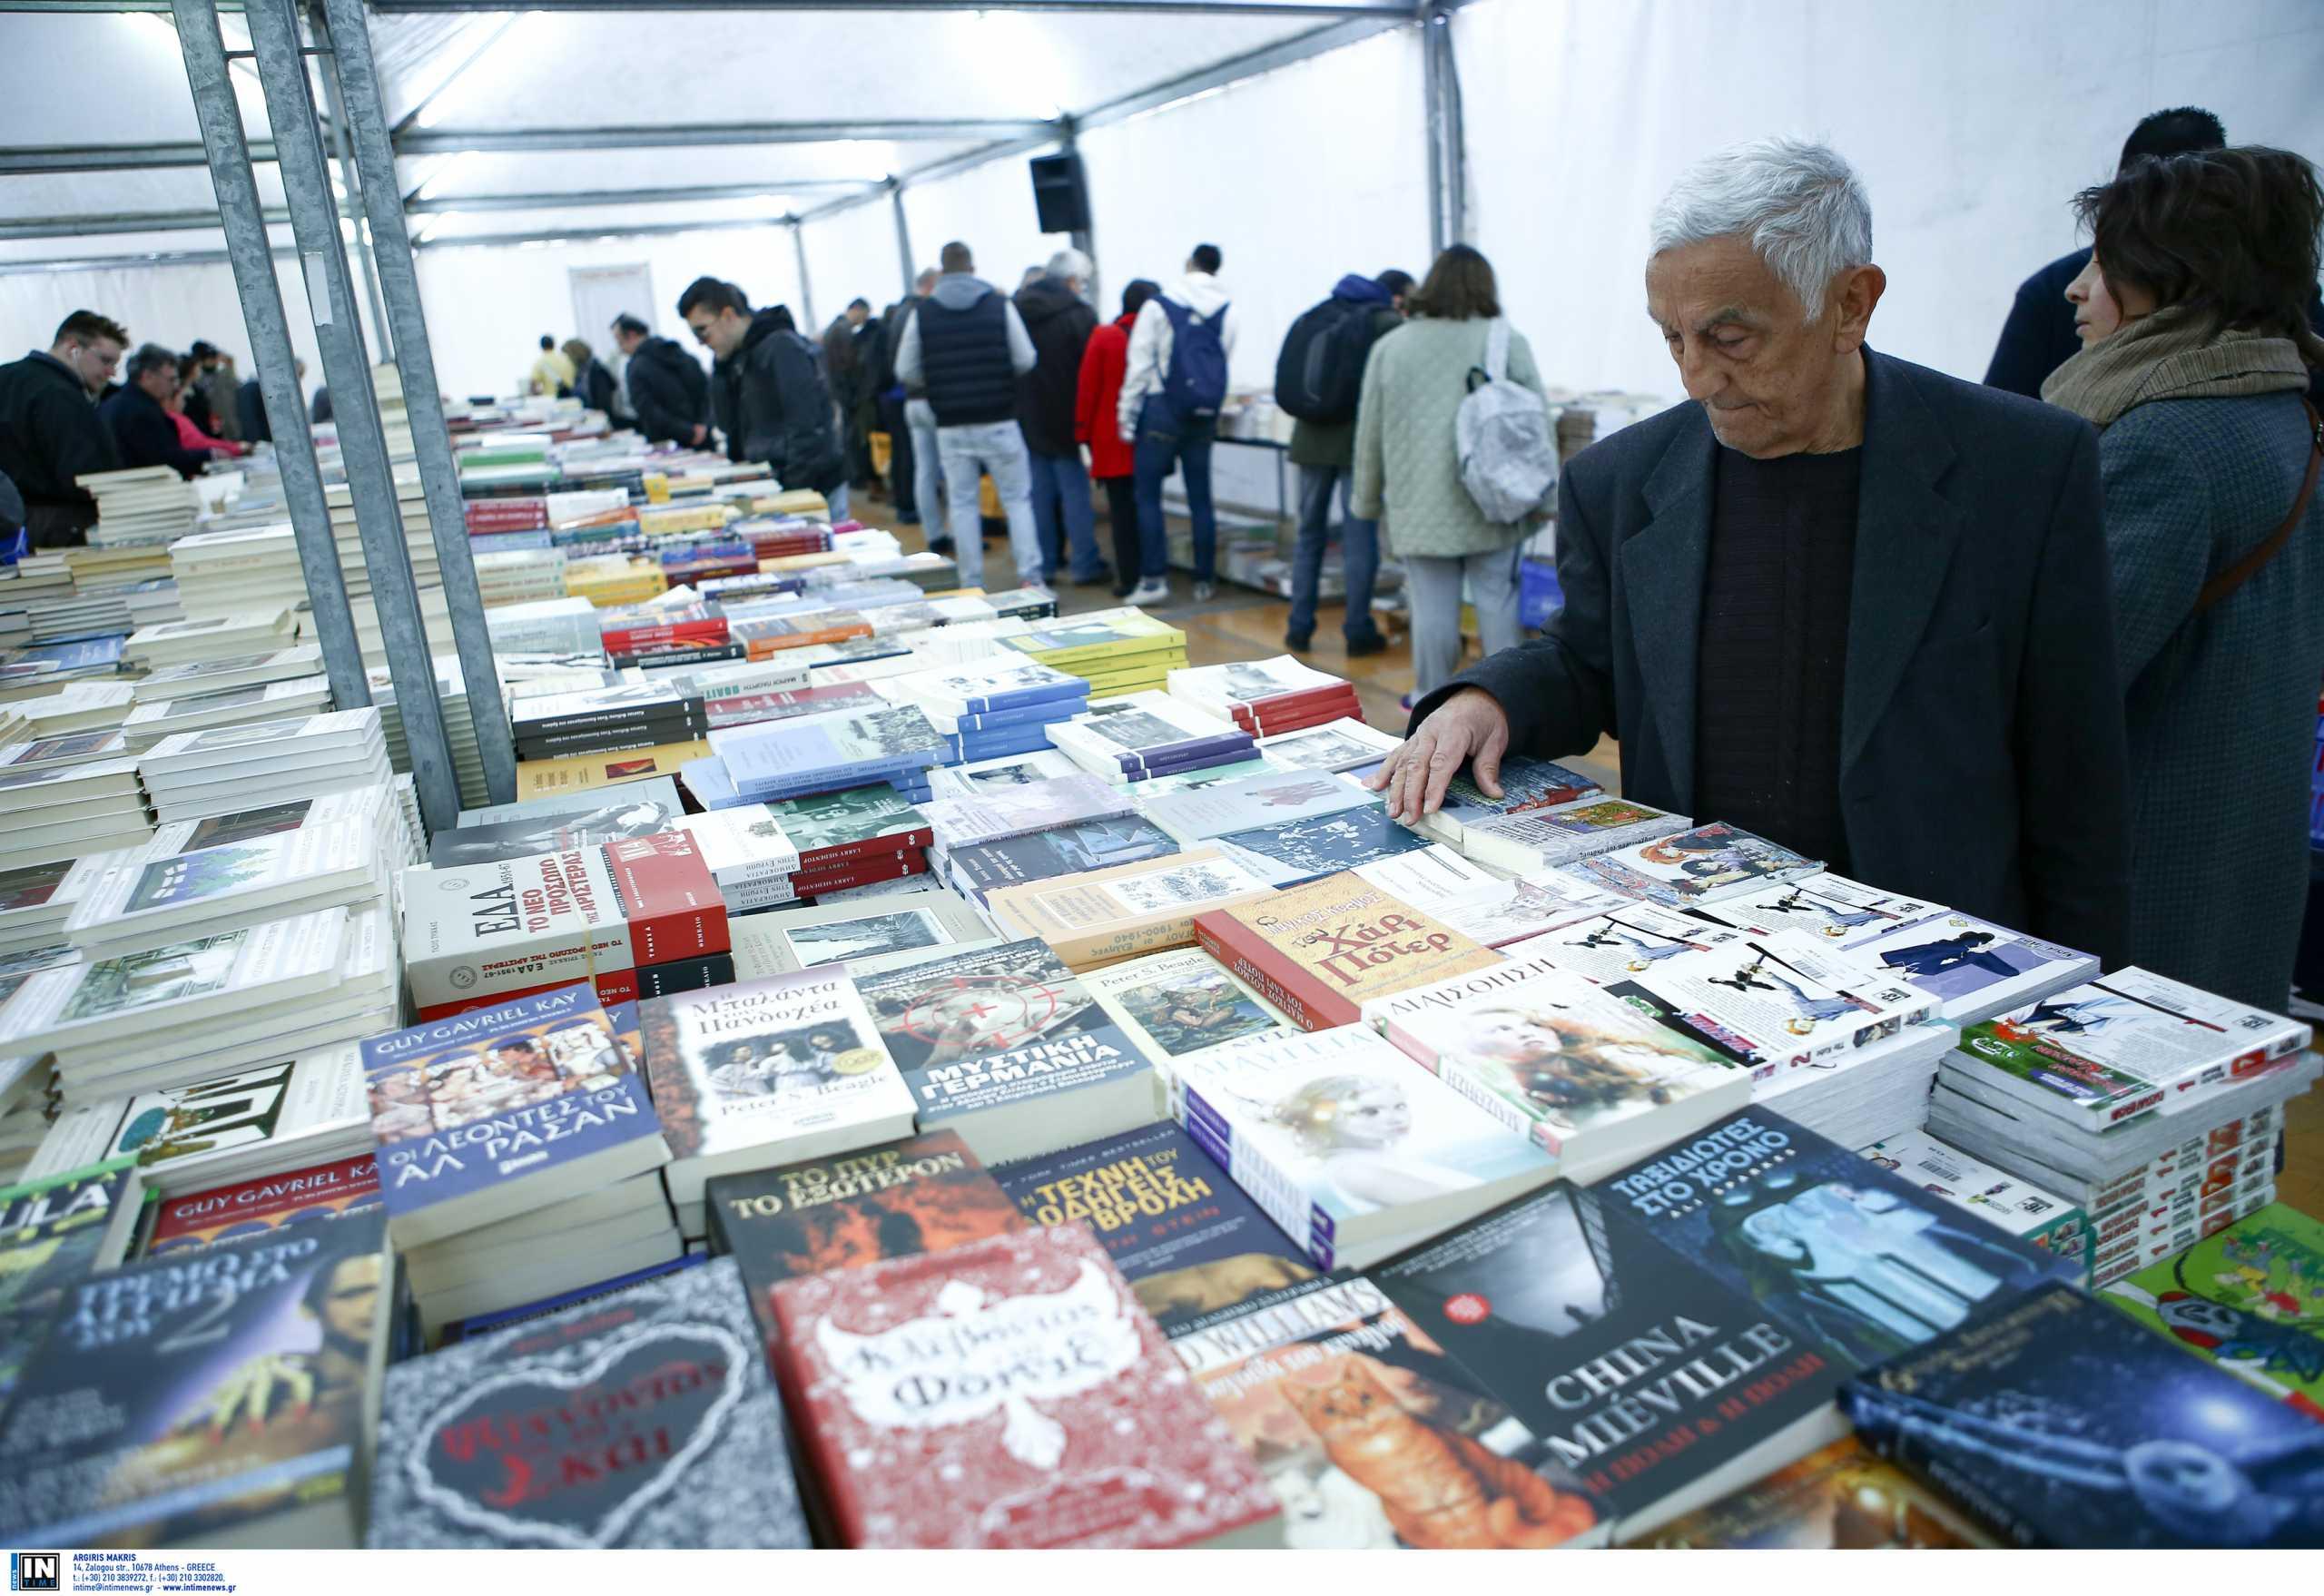 Voucher €20 σε ανέργους ως 24 ετών για βιβλία από Υπουργείο Πολιτισμού και ΟΑΕΔ